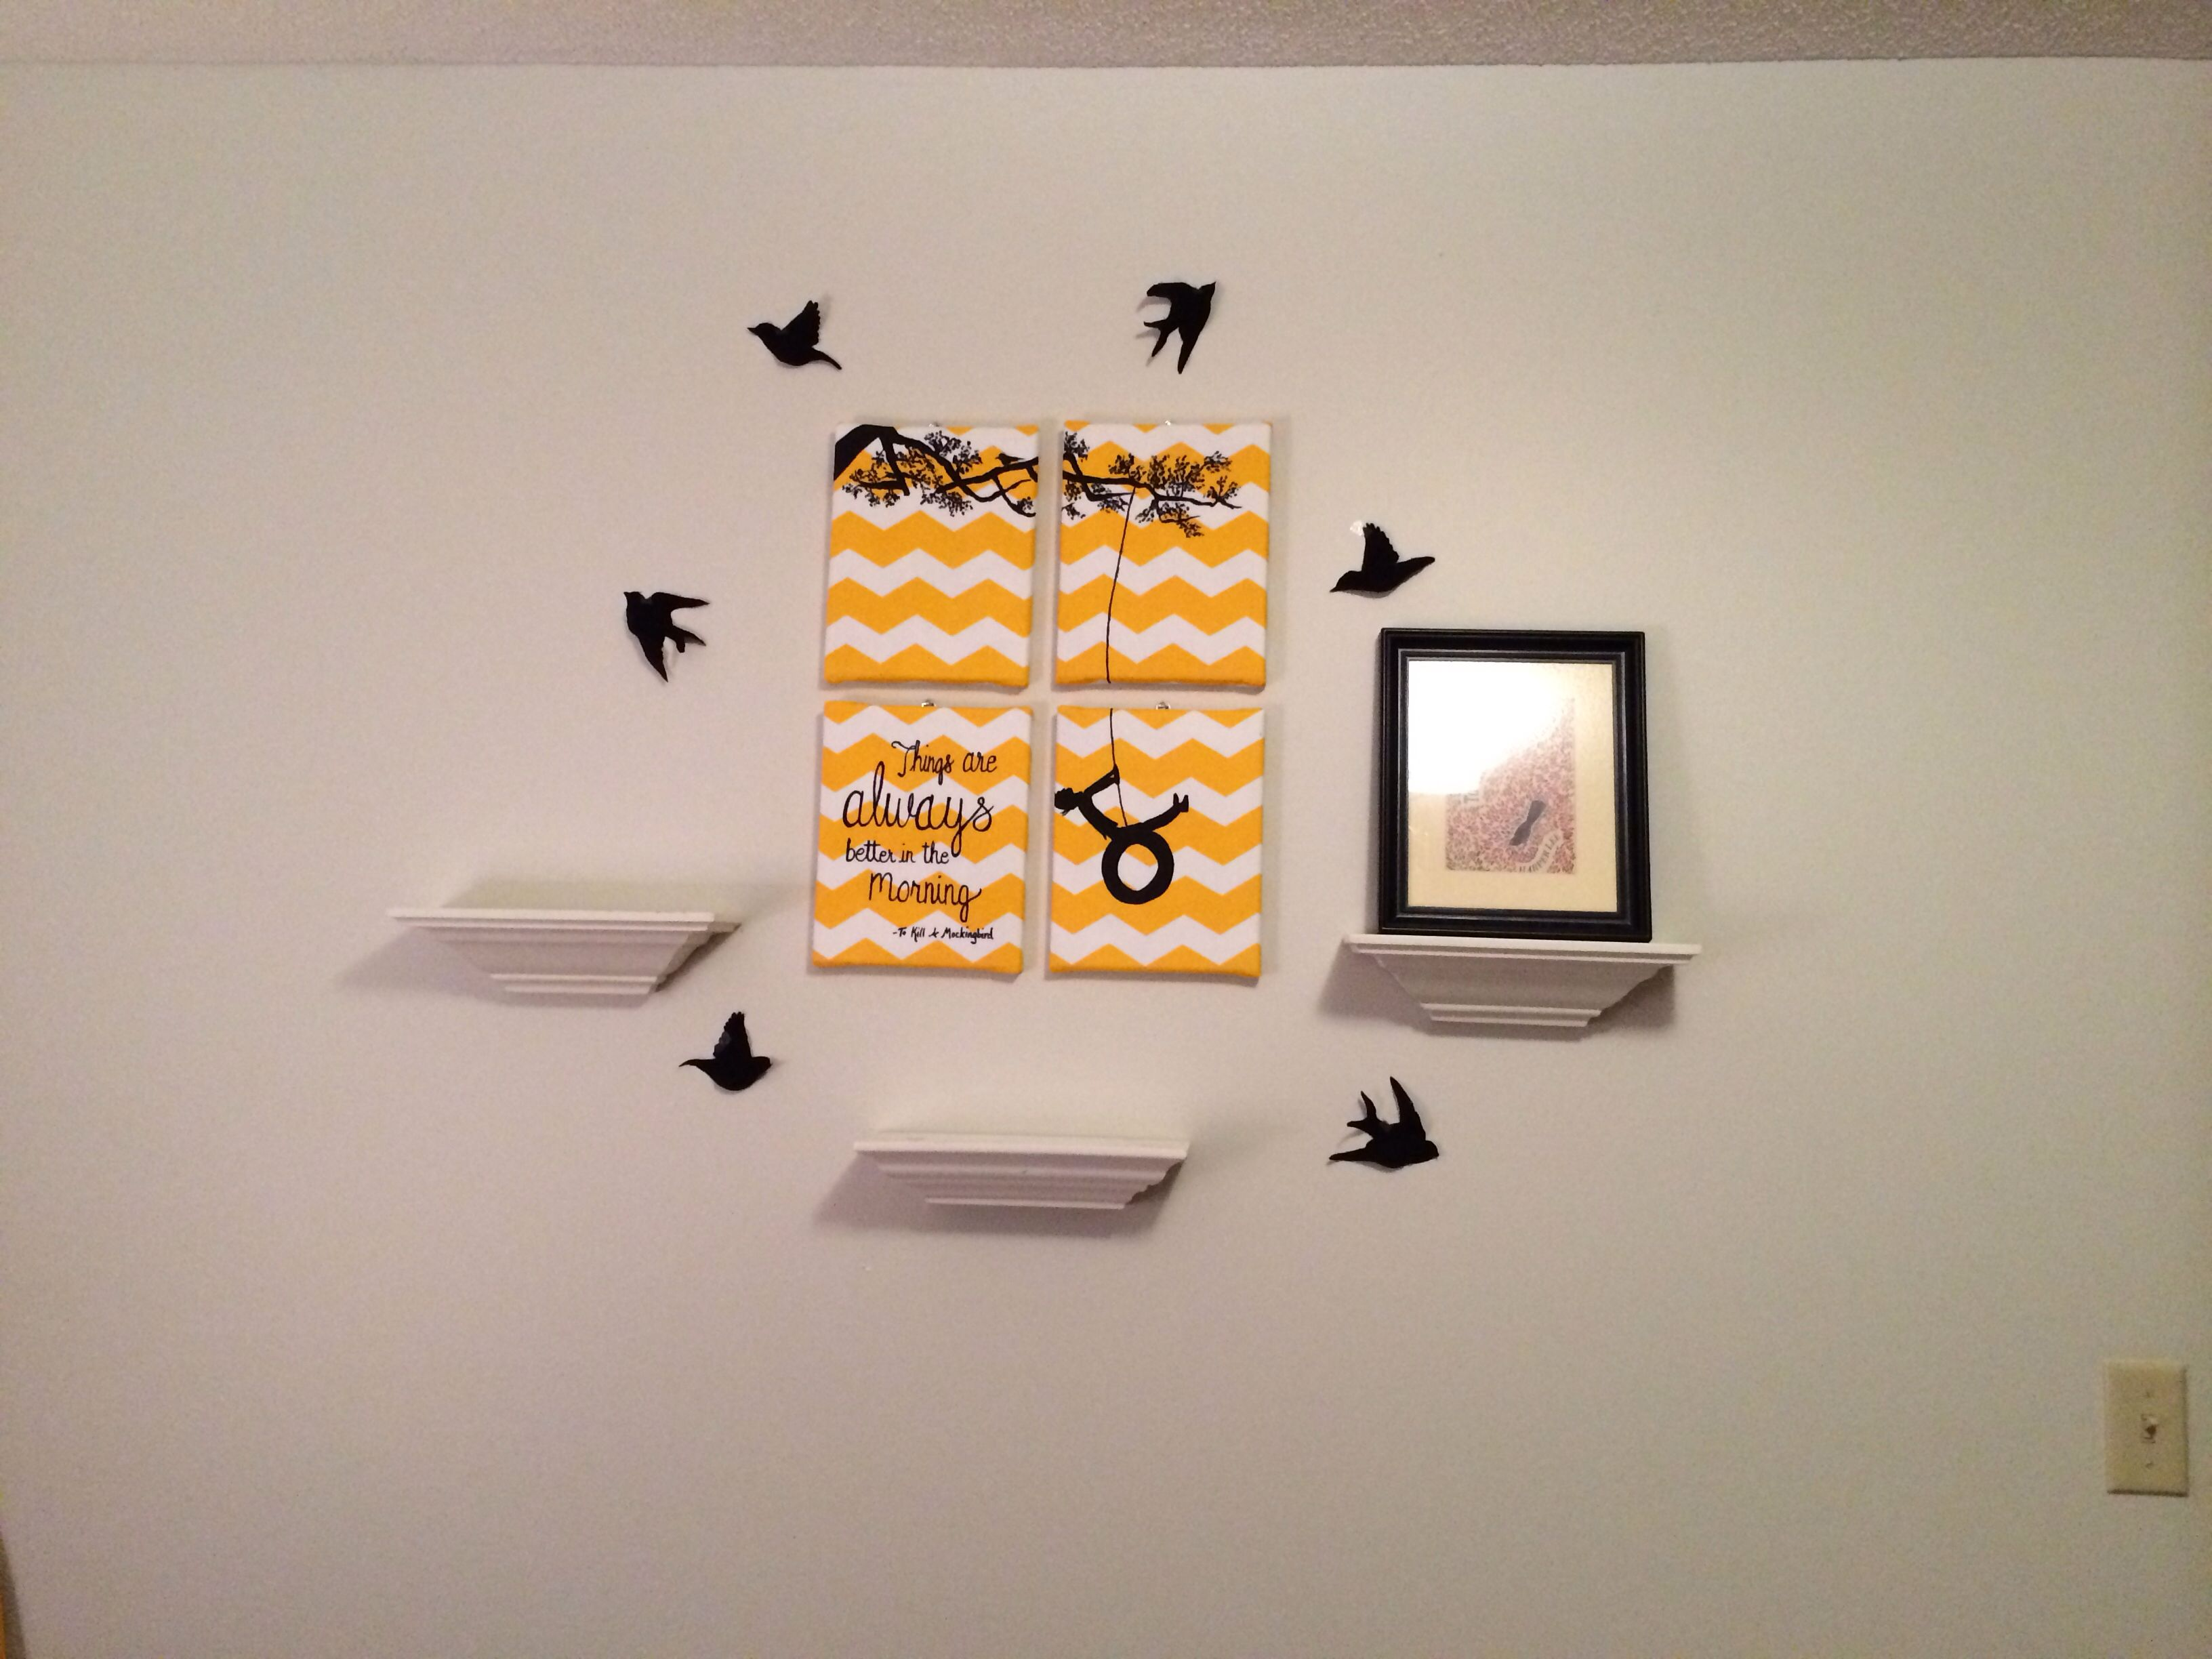 Kill mockingbird scrapbook ideas - Baby Room To Kill A Mockingbird Theme